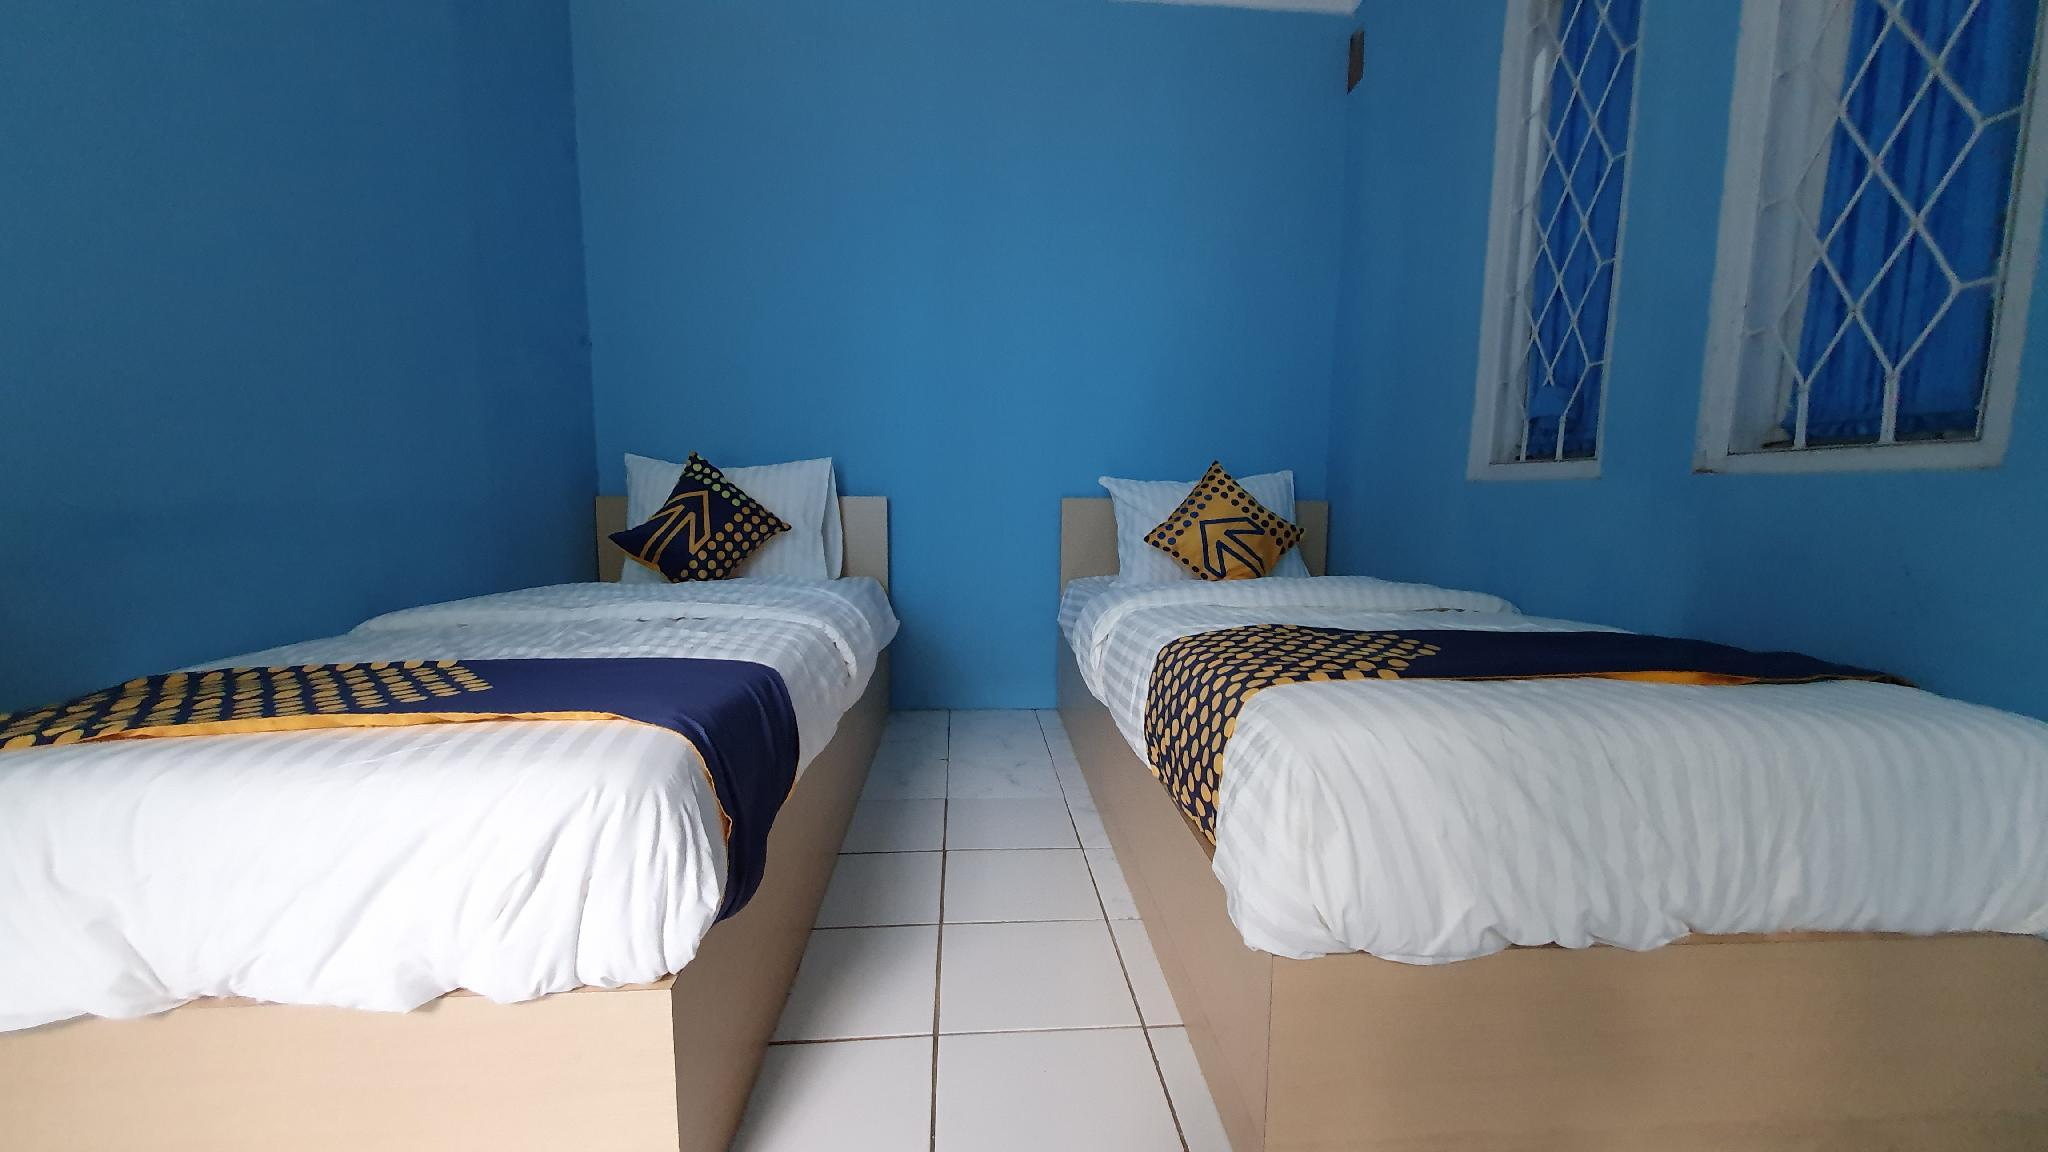 Oyo 2302 Blue House Costel Puncak Promo Terbaru 2020 Rp 150303 Foto Hd Ulasan